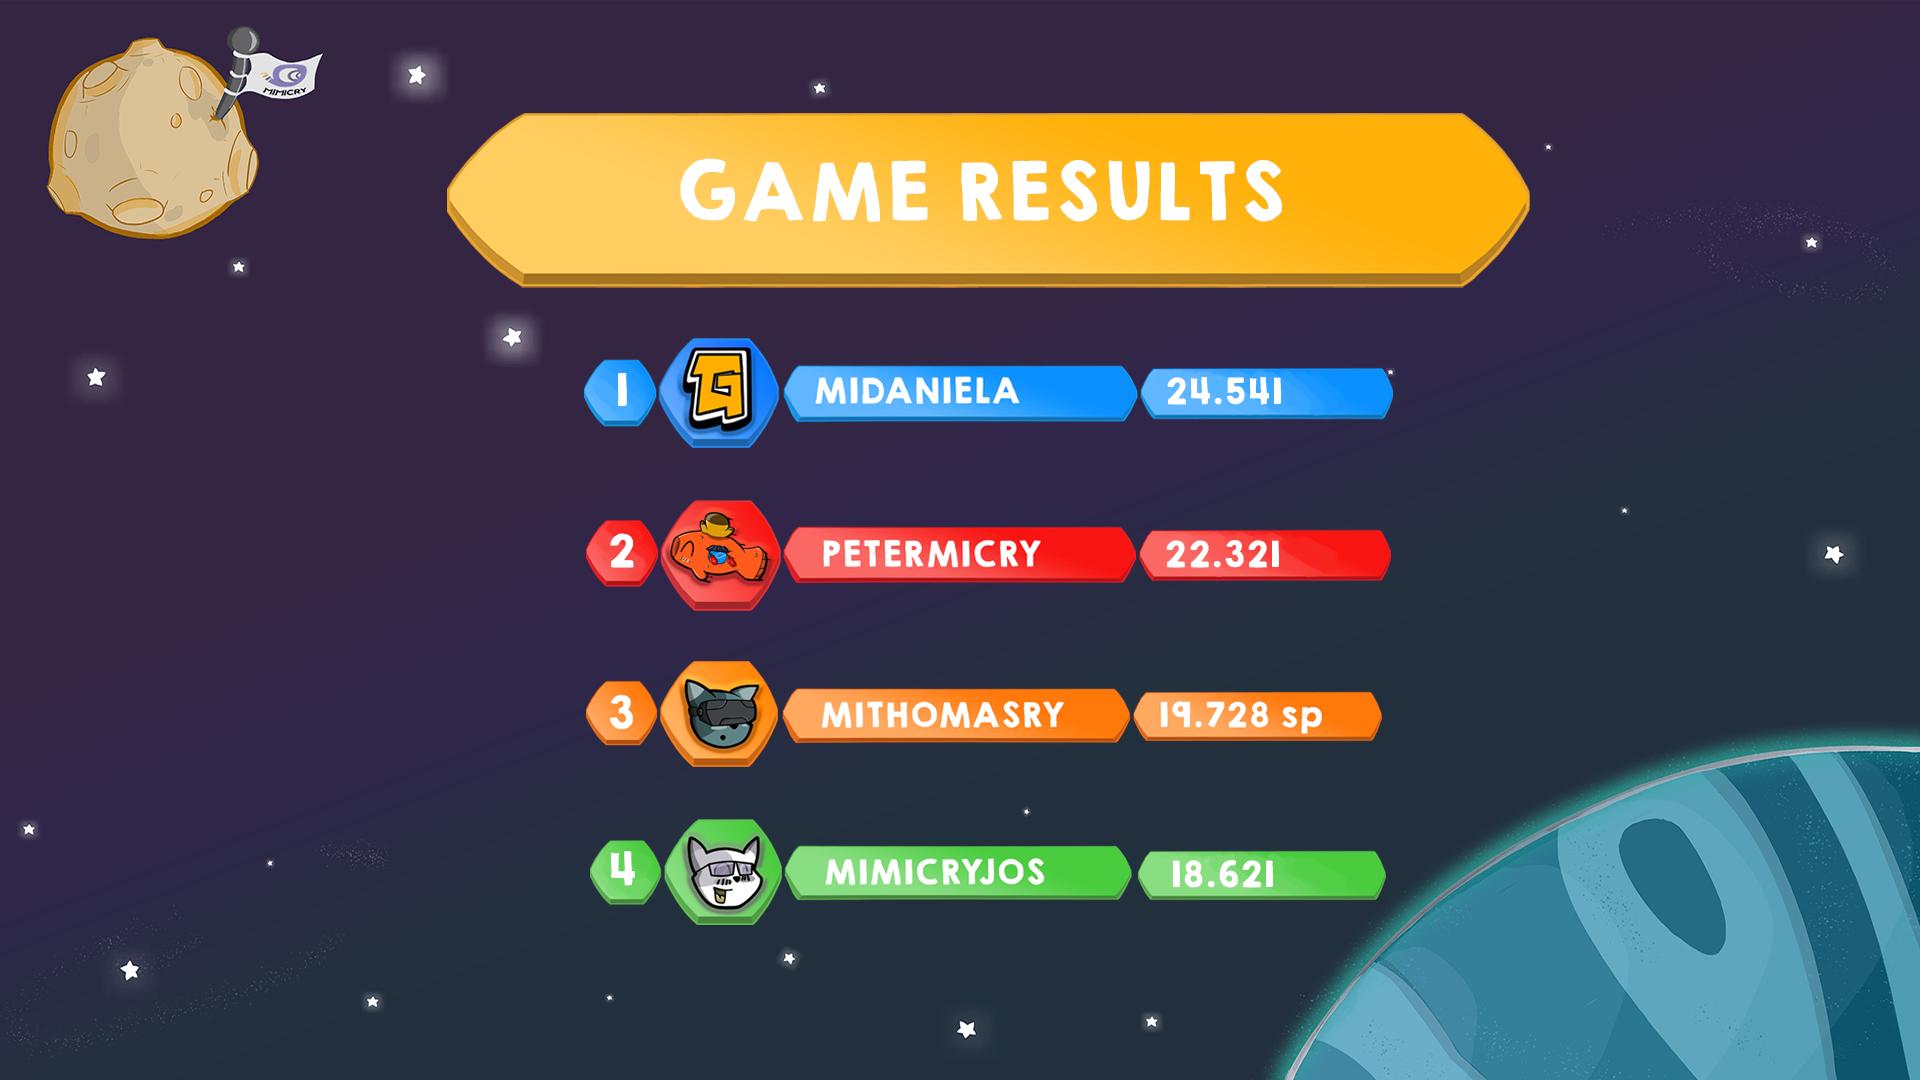 Game results for arcade mode Ganbatte match